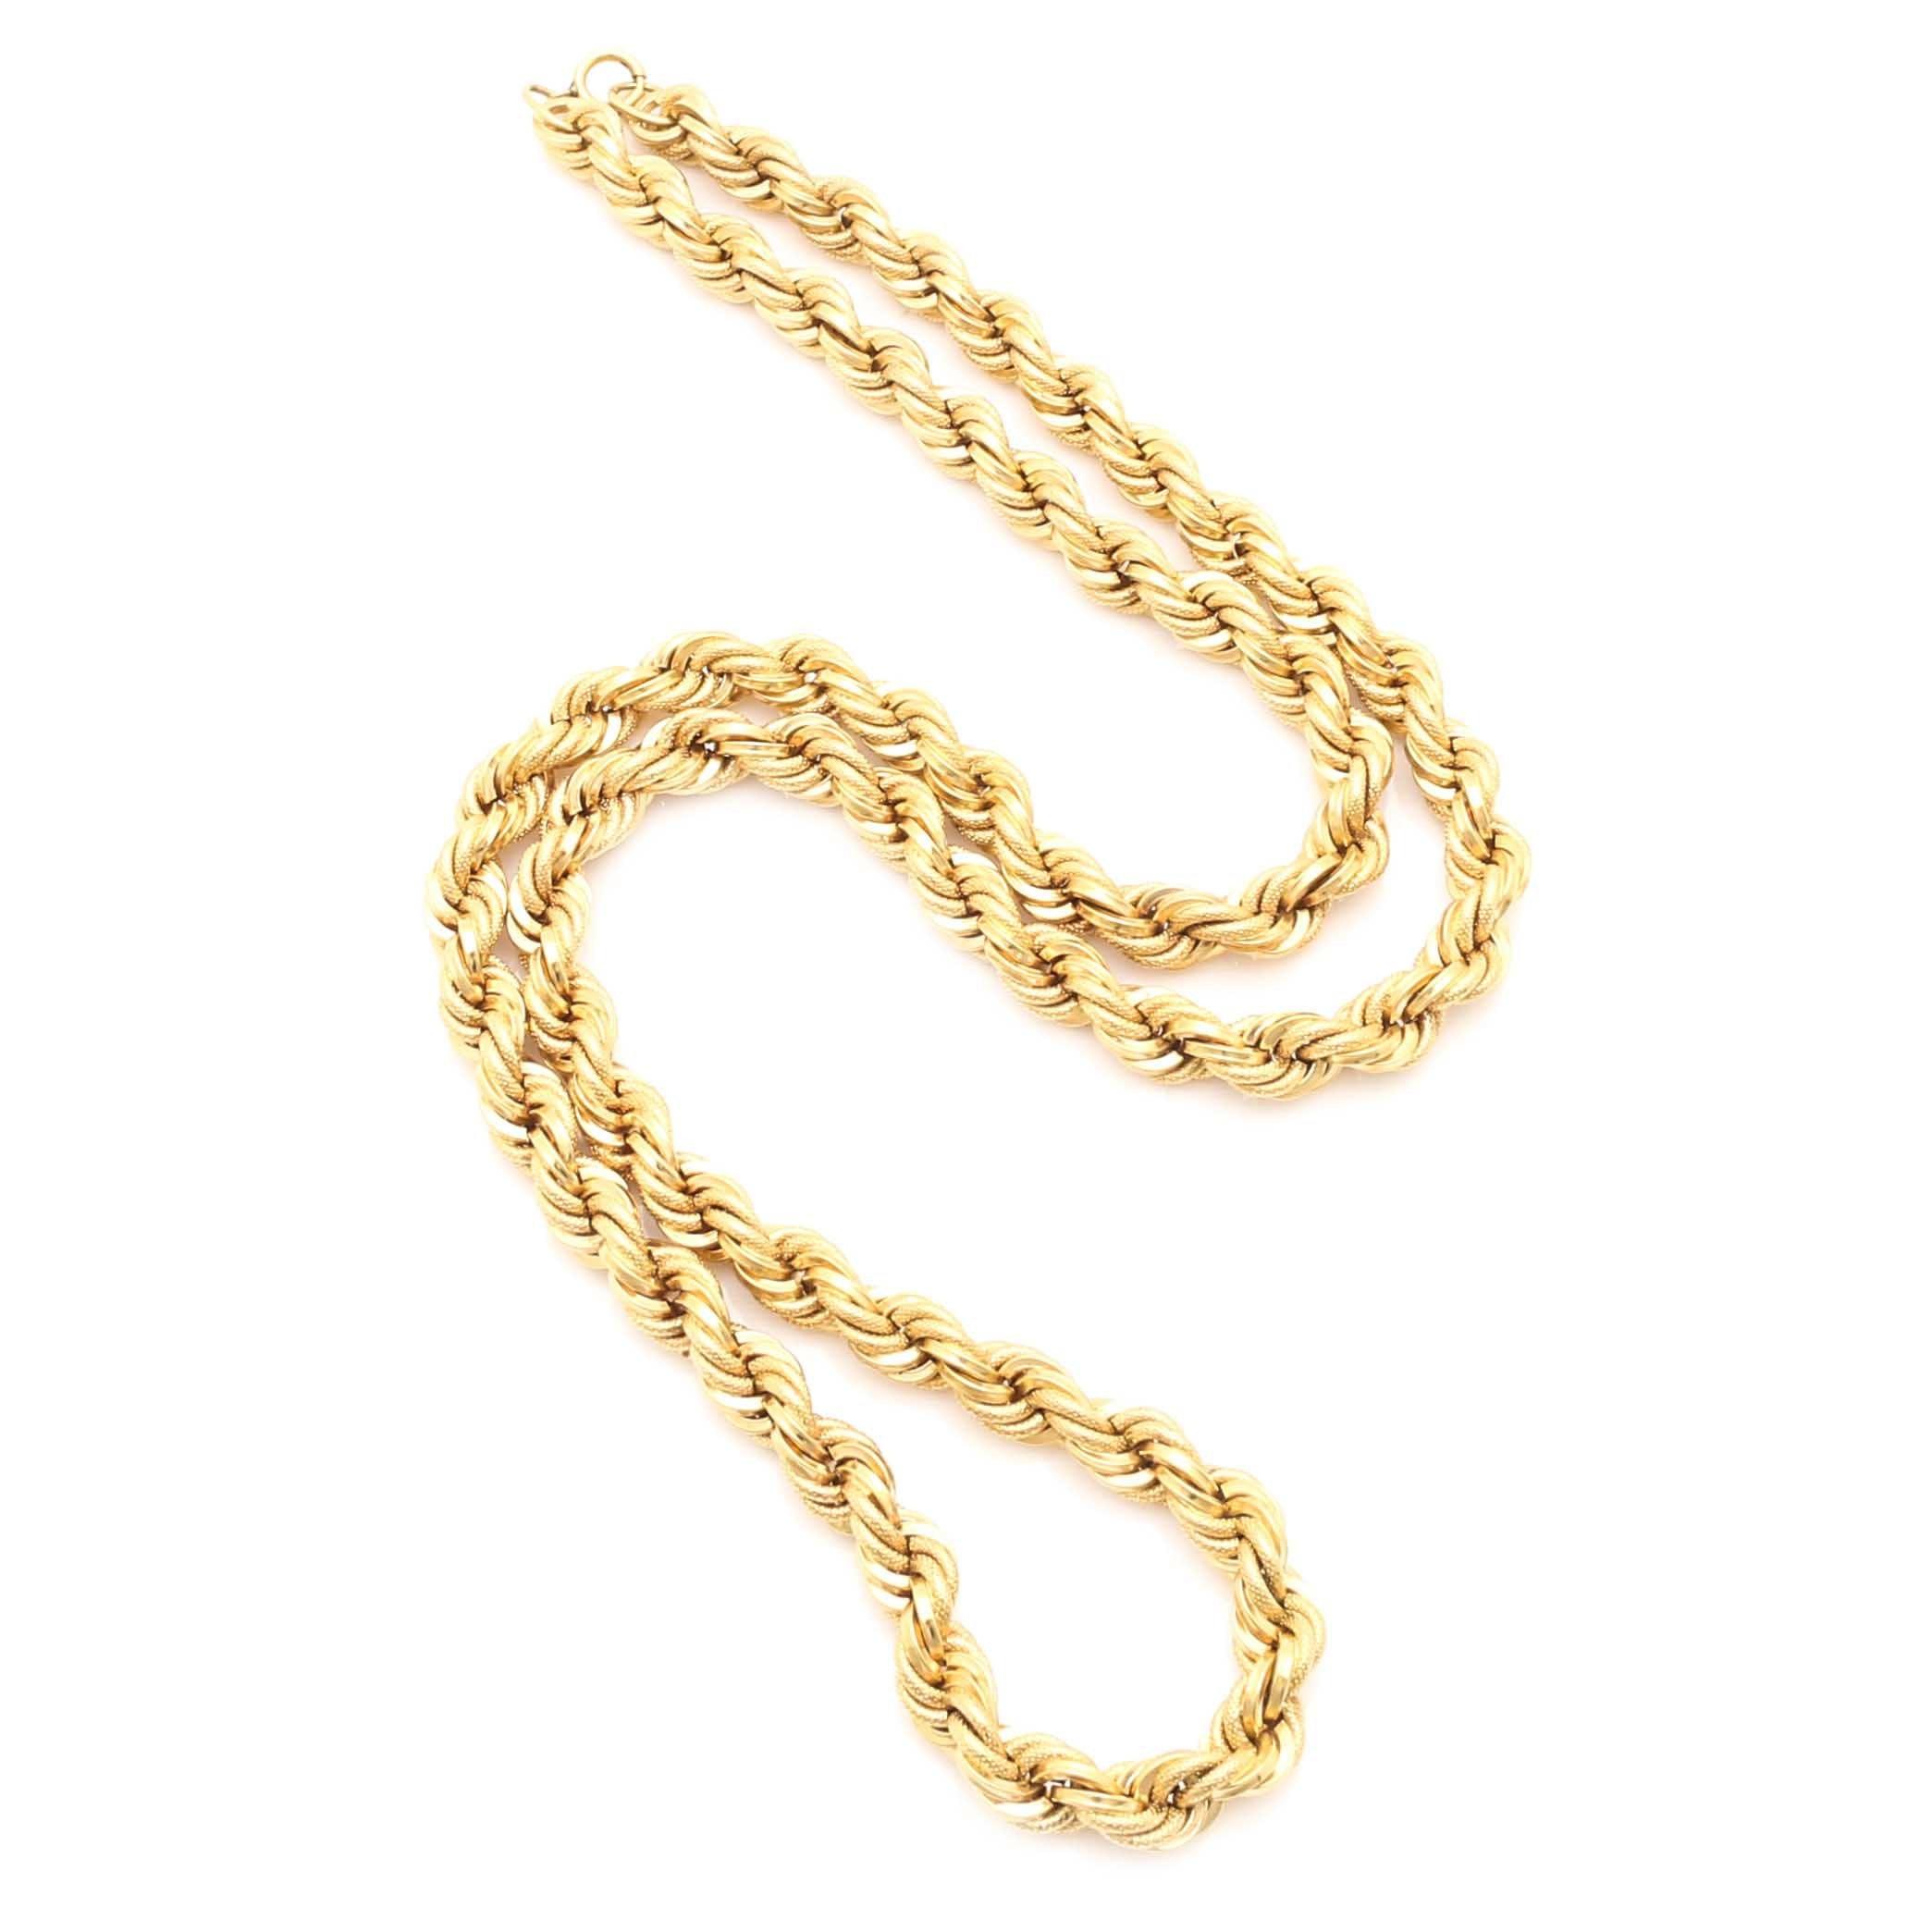 18K Yellow Gold Textured Rope Chain